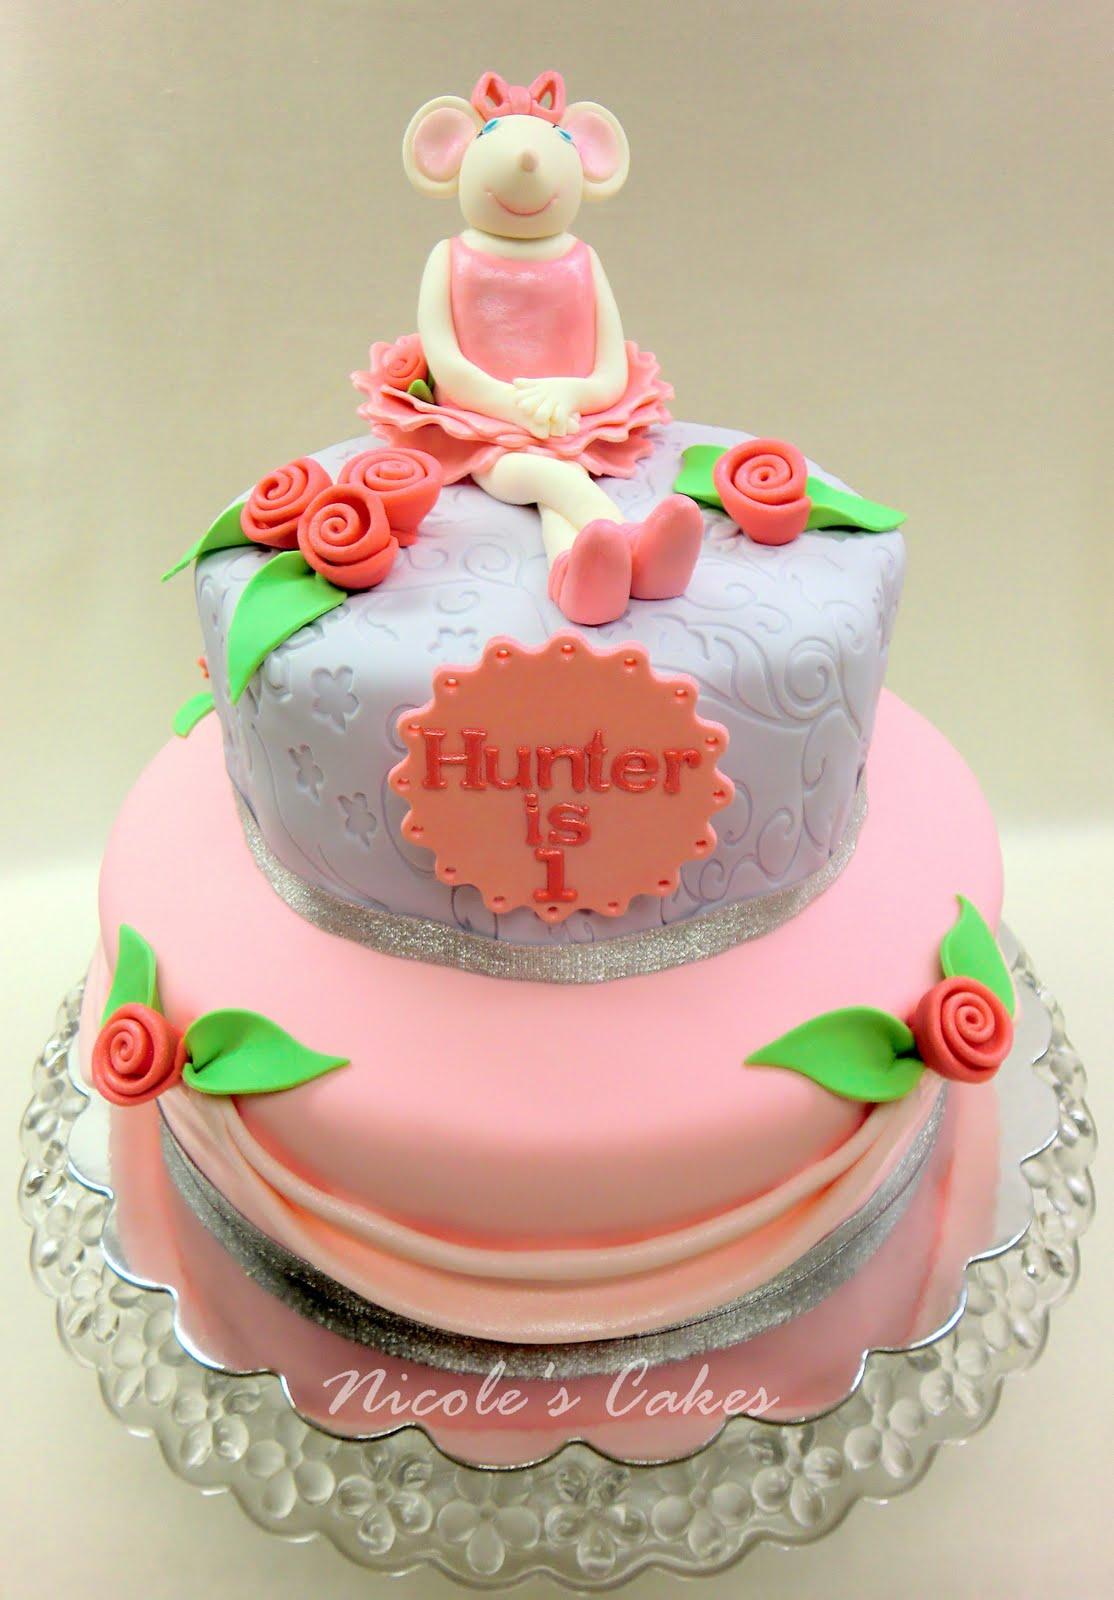 On Birthday Cakes Angelina Ballerina 1st Birthday Cake